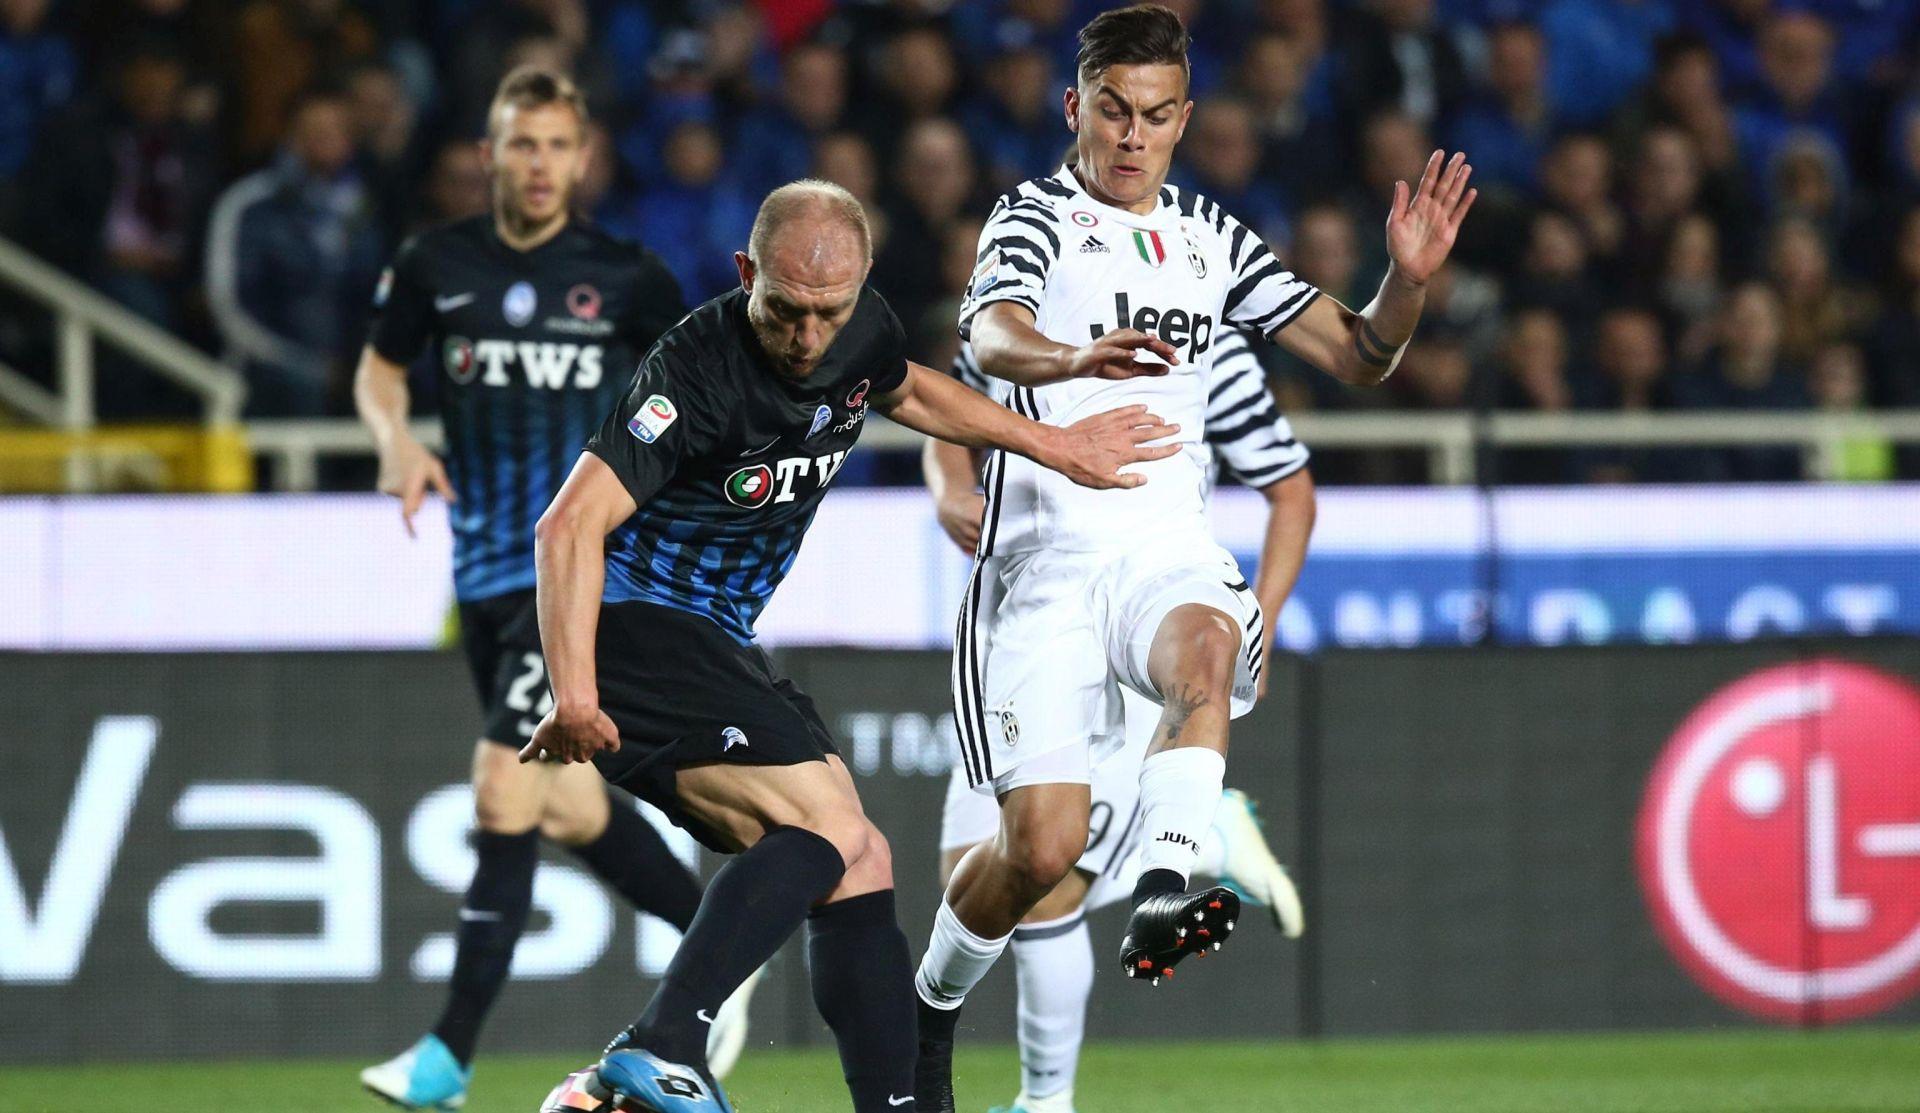 ITALIJA Atalanta 'ukrala' dva boda Juventusu